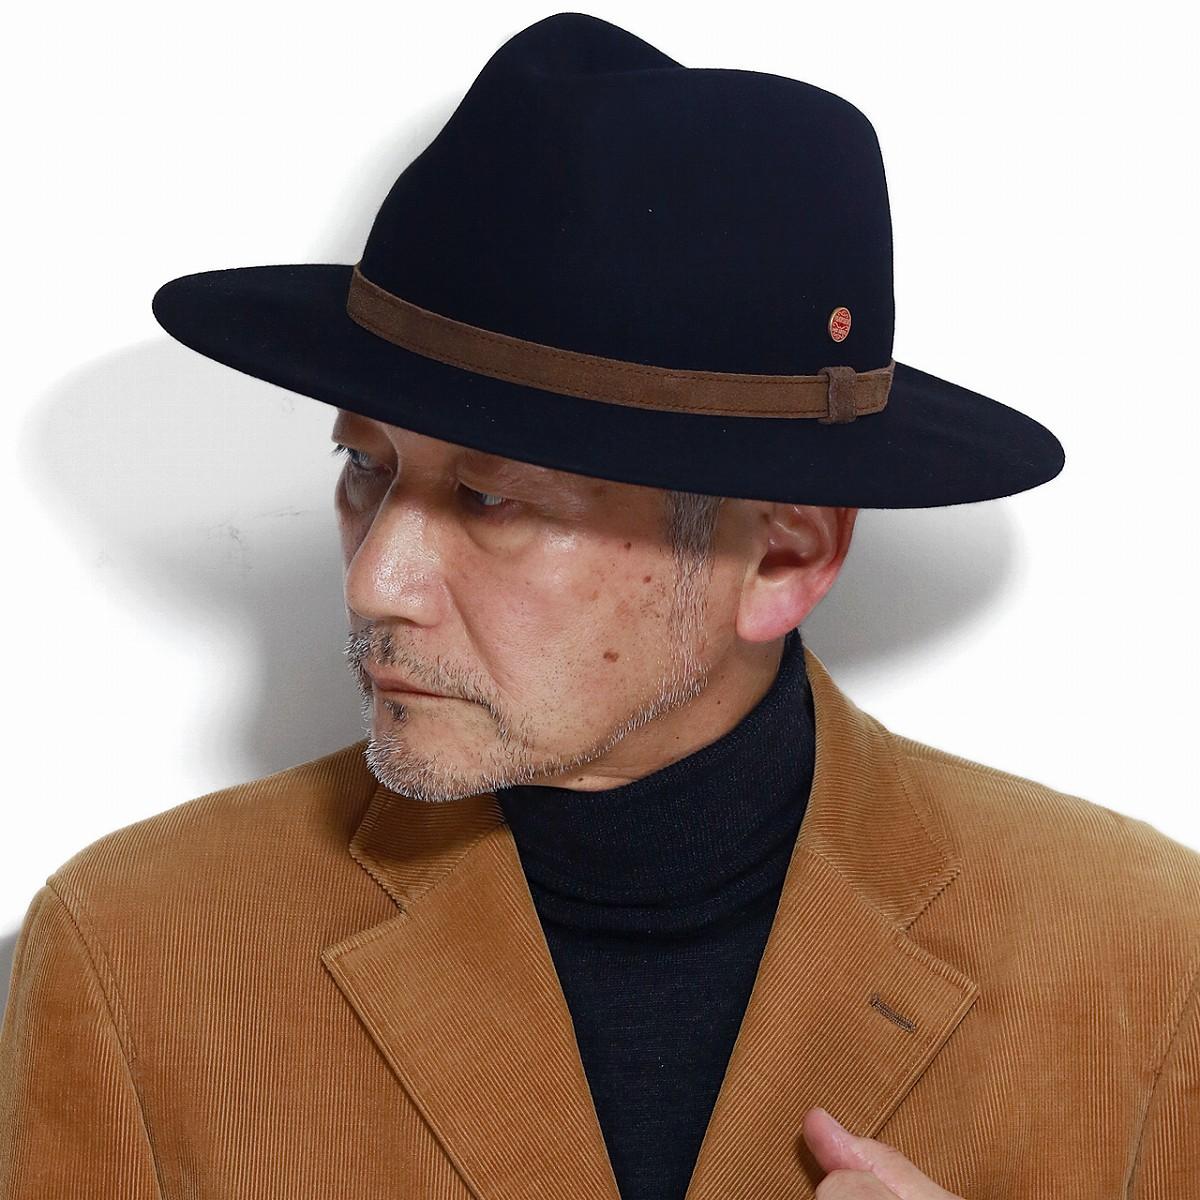 729512df1e66a ELEHELM HAT STORE  Y ditch rim suede genuine leather hat soft felt hat hat  men Mai Zara bit fur felt hat Lady s felt hat men MAYSER trilby hat Shin  pull ...